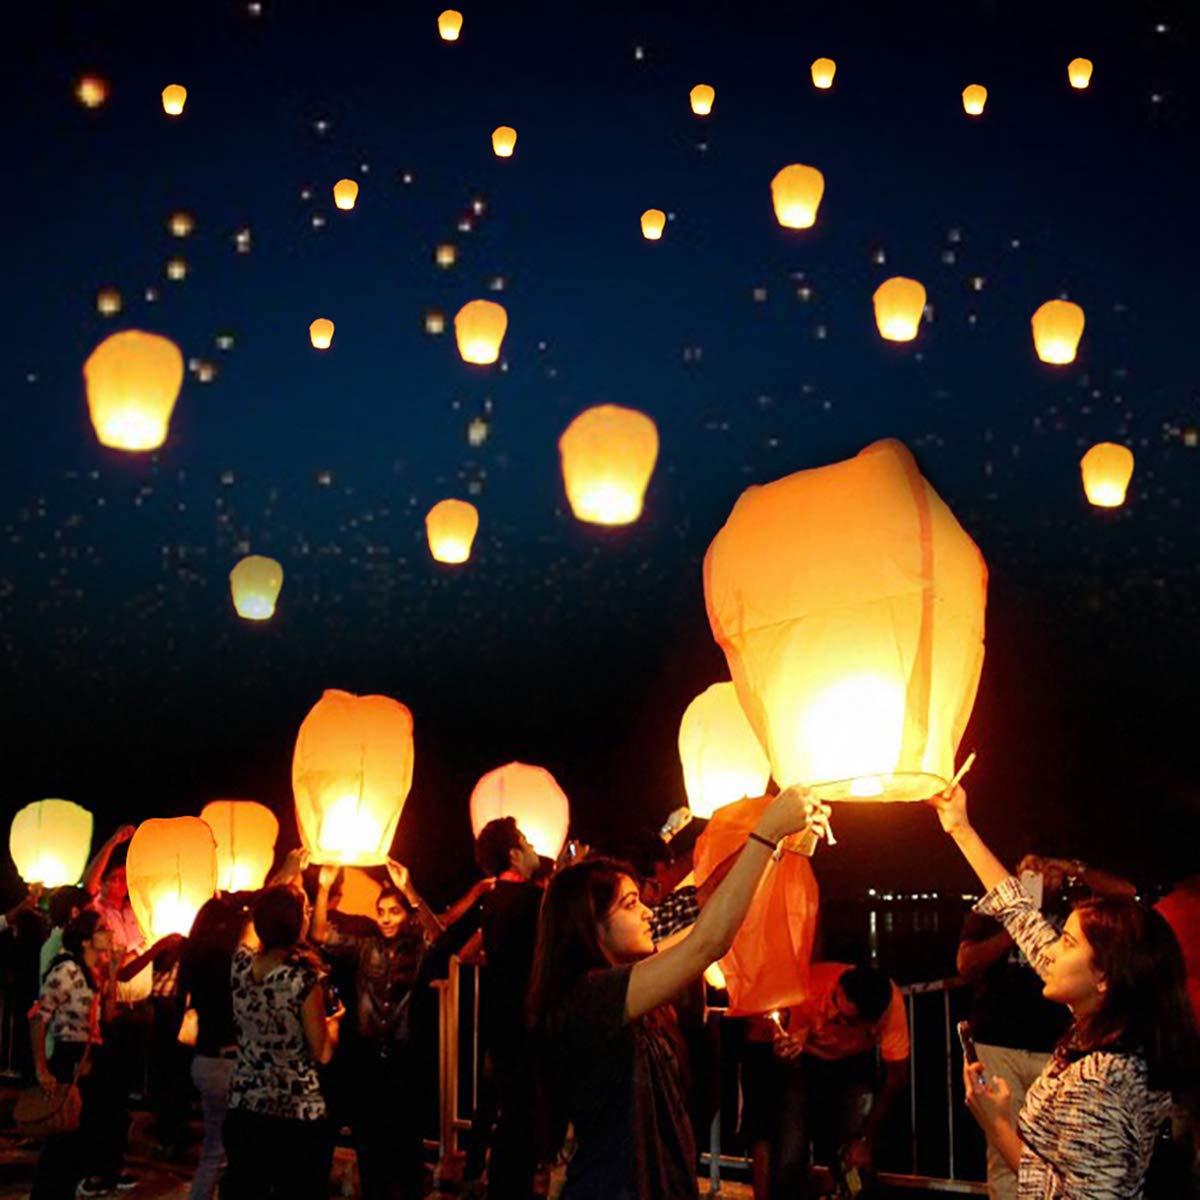 (Pack of 20) Chinese Lanterns ECO Friendly - 100% Biodegradable- Beautiful Lanterns for White Flying Wish Lanterns, Birthdays, Souvenirs